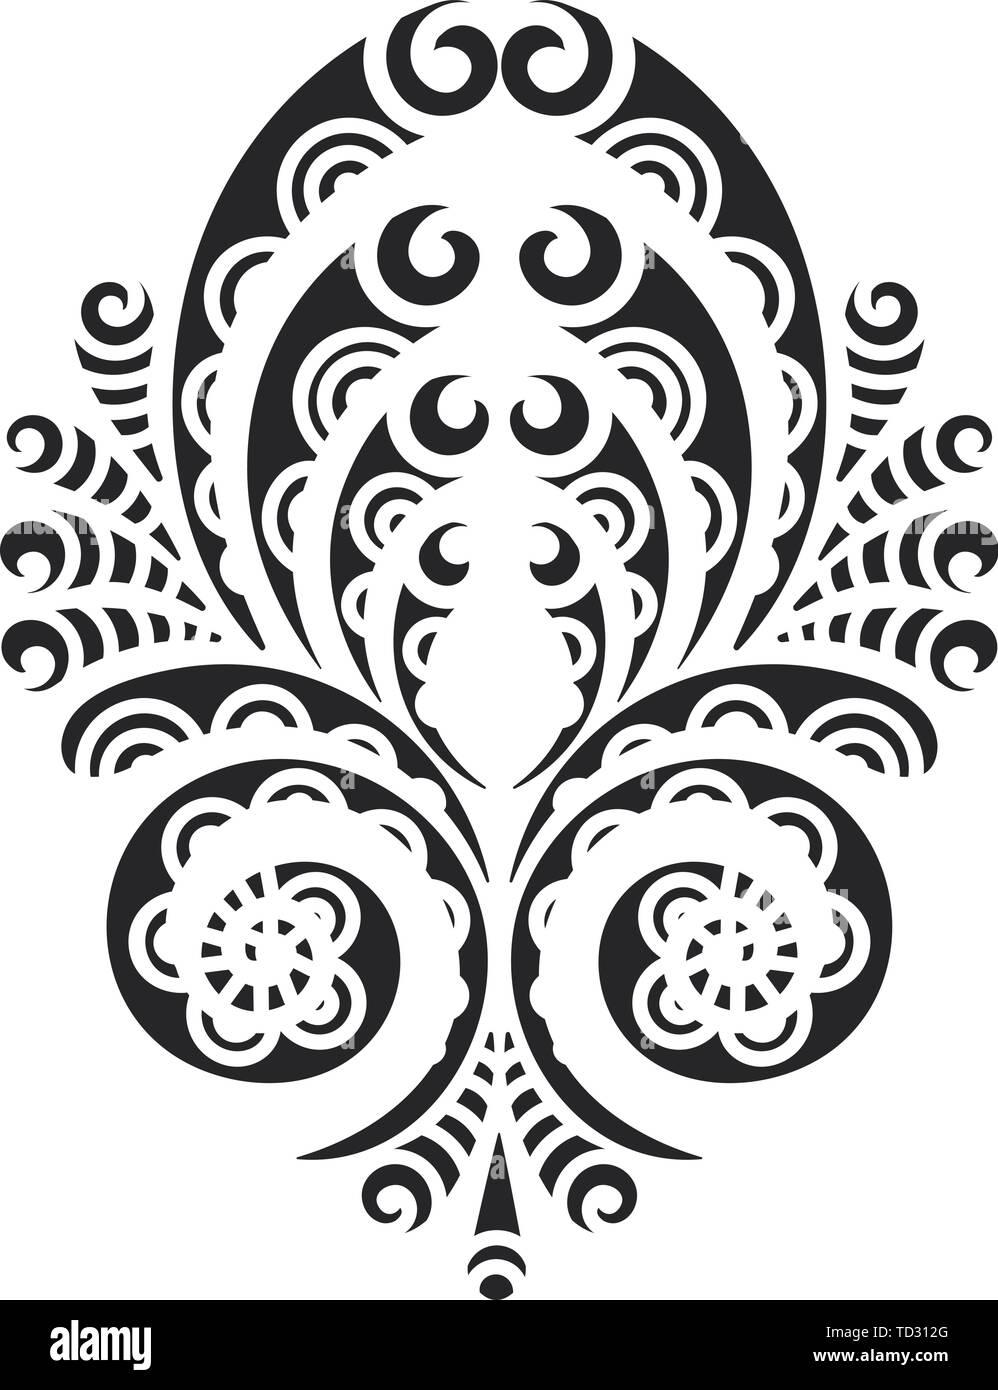 Vintage Decorative Calligraphic Borders Template Signage